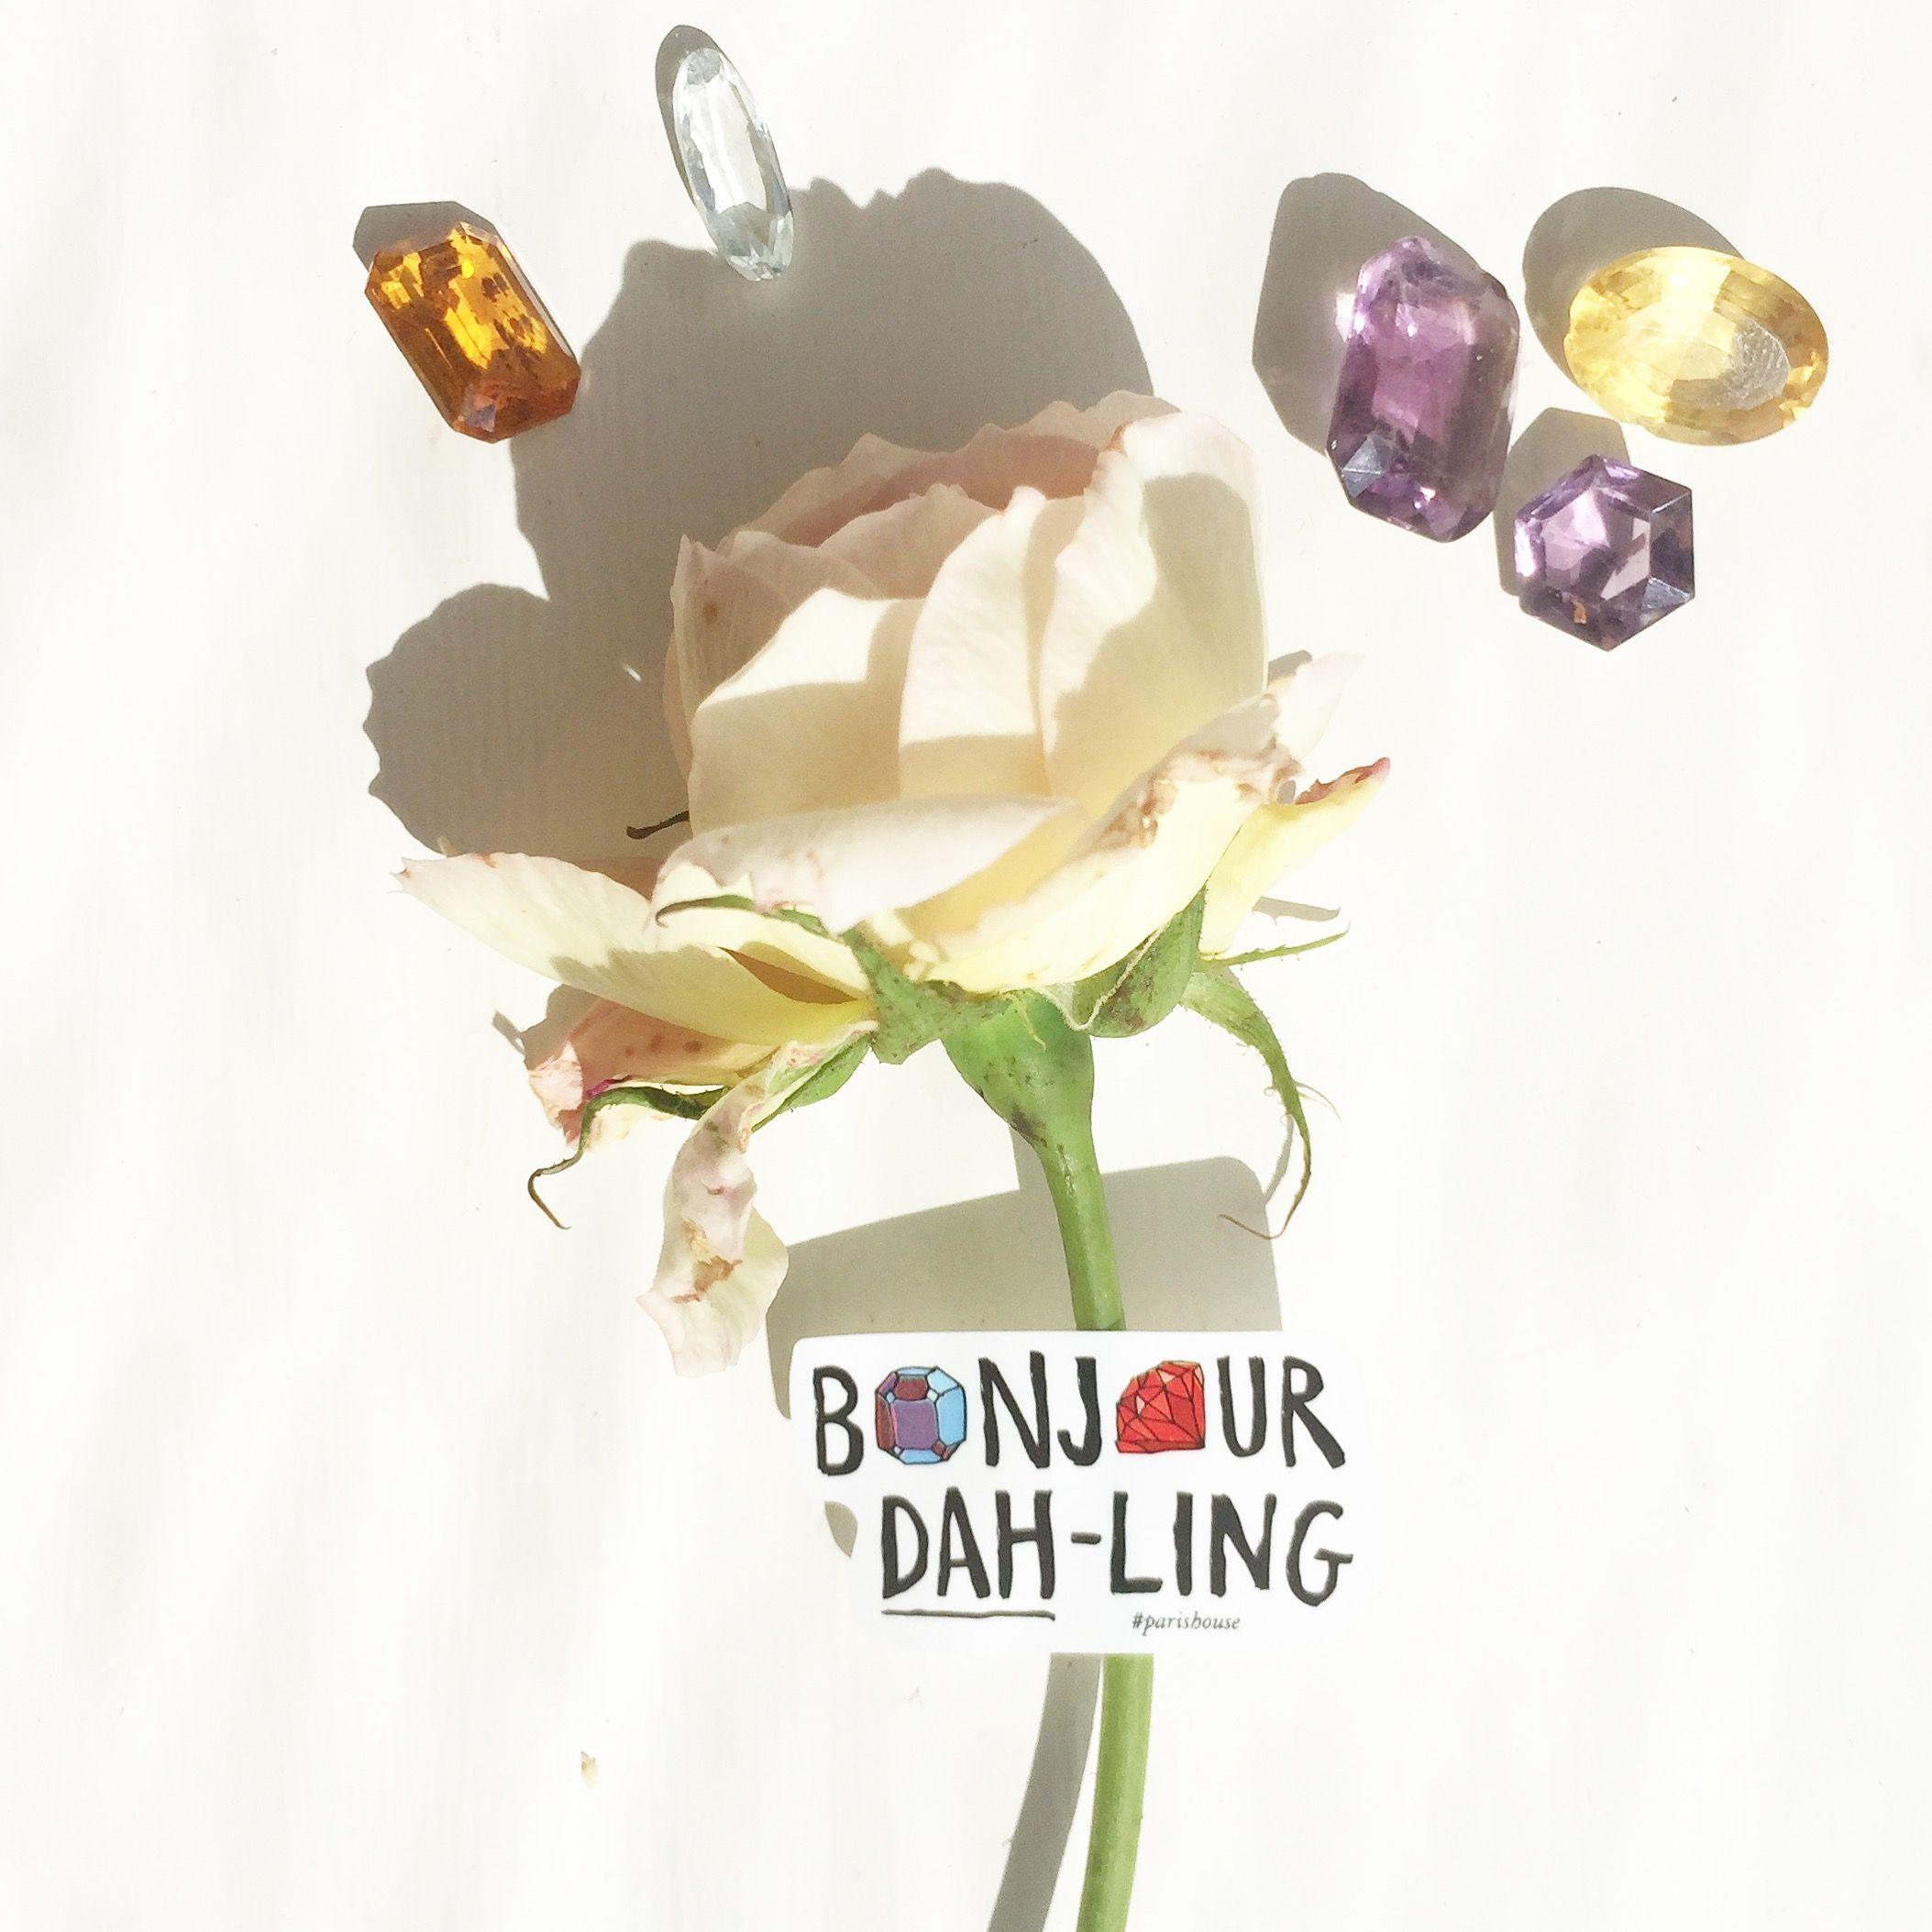 Bonjour Dah-Ling